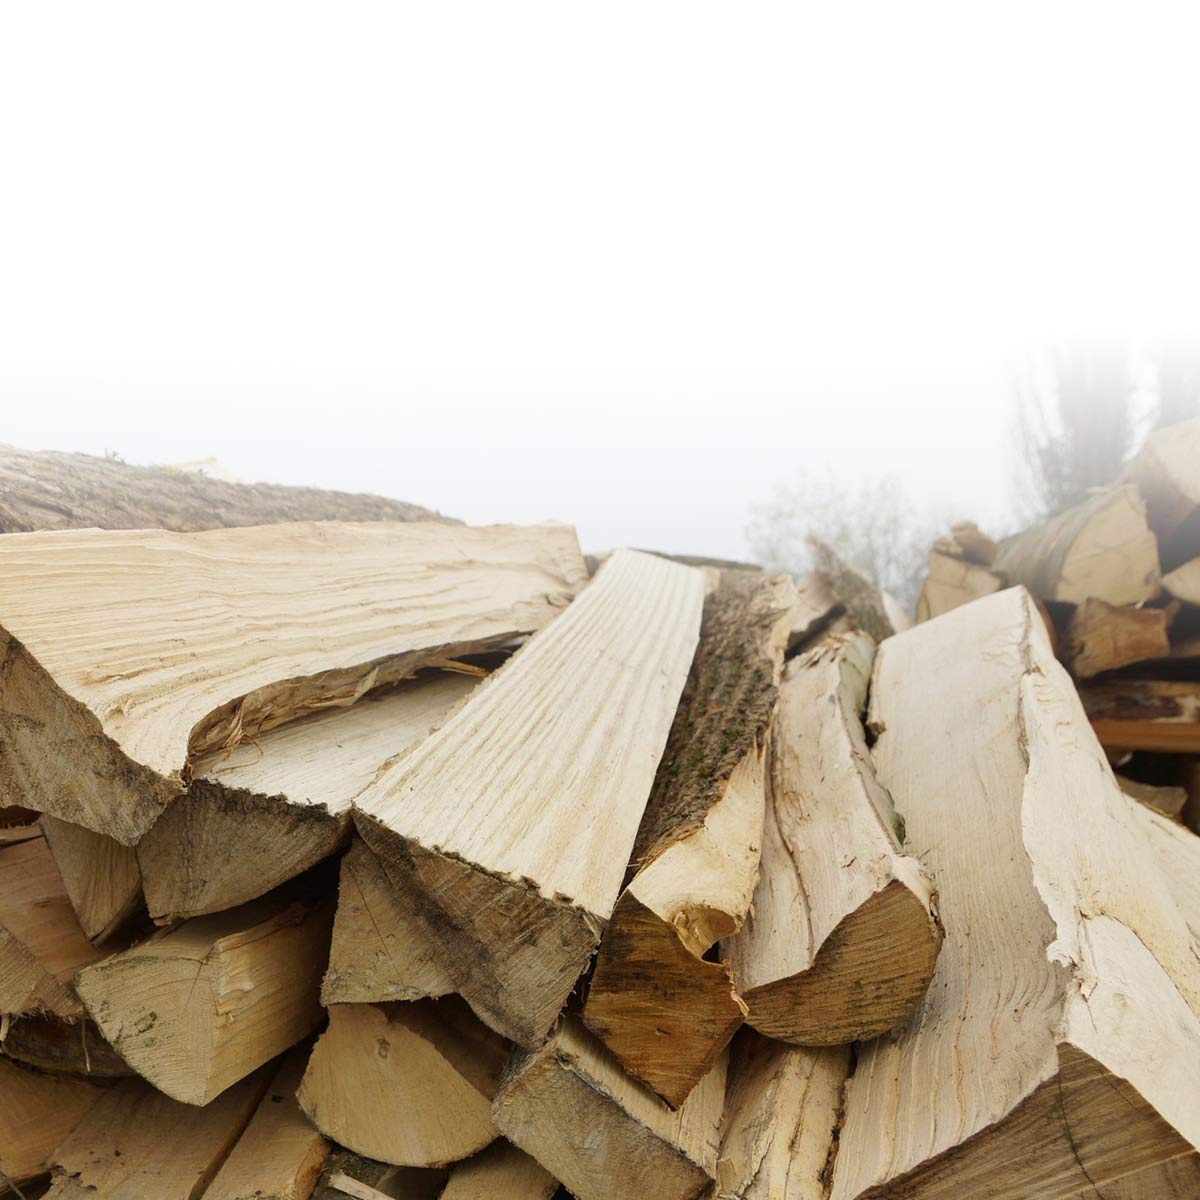 Kindling M Navaris Aluminium Wood Splitting Wedge Metal Log Cleaving Cutting Splitter Aid Tool for Chopping Oversized Logs 0.8 kg Firewood